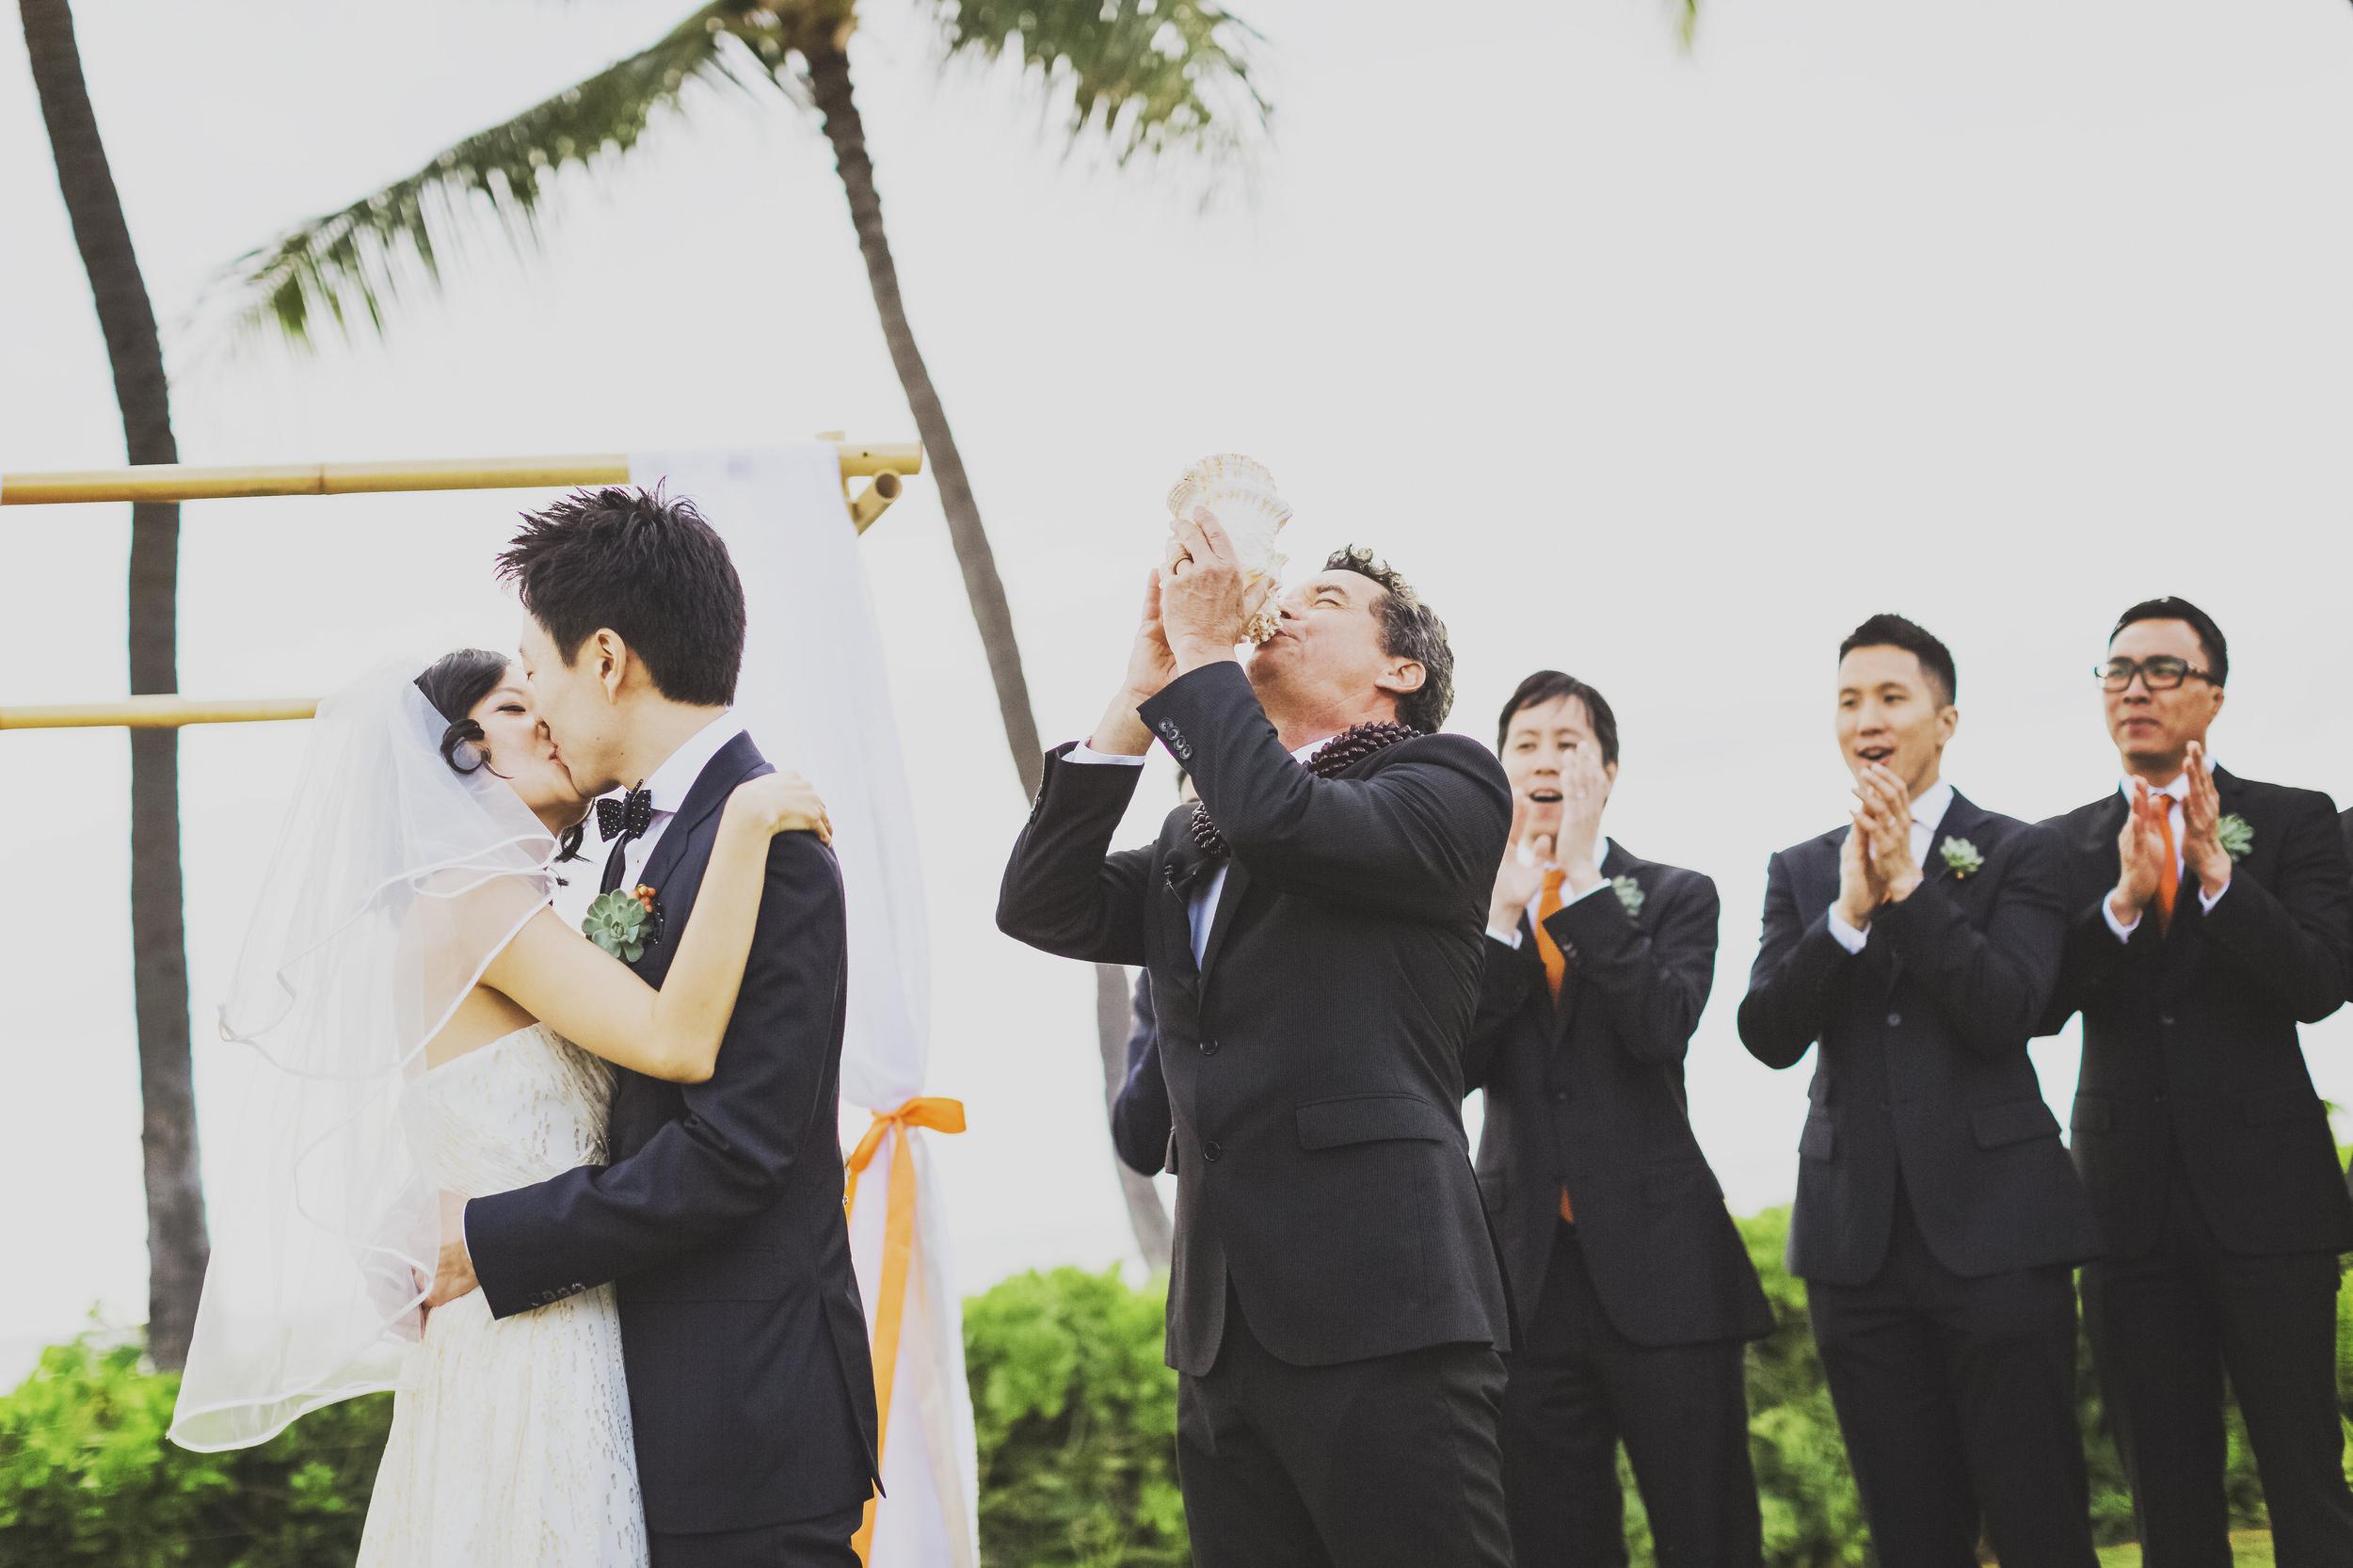 angie-diaz-photography-oahu-wedding-lanikuhonoa-shenshen-marshall-34.jpg